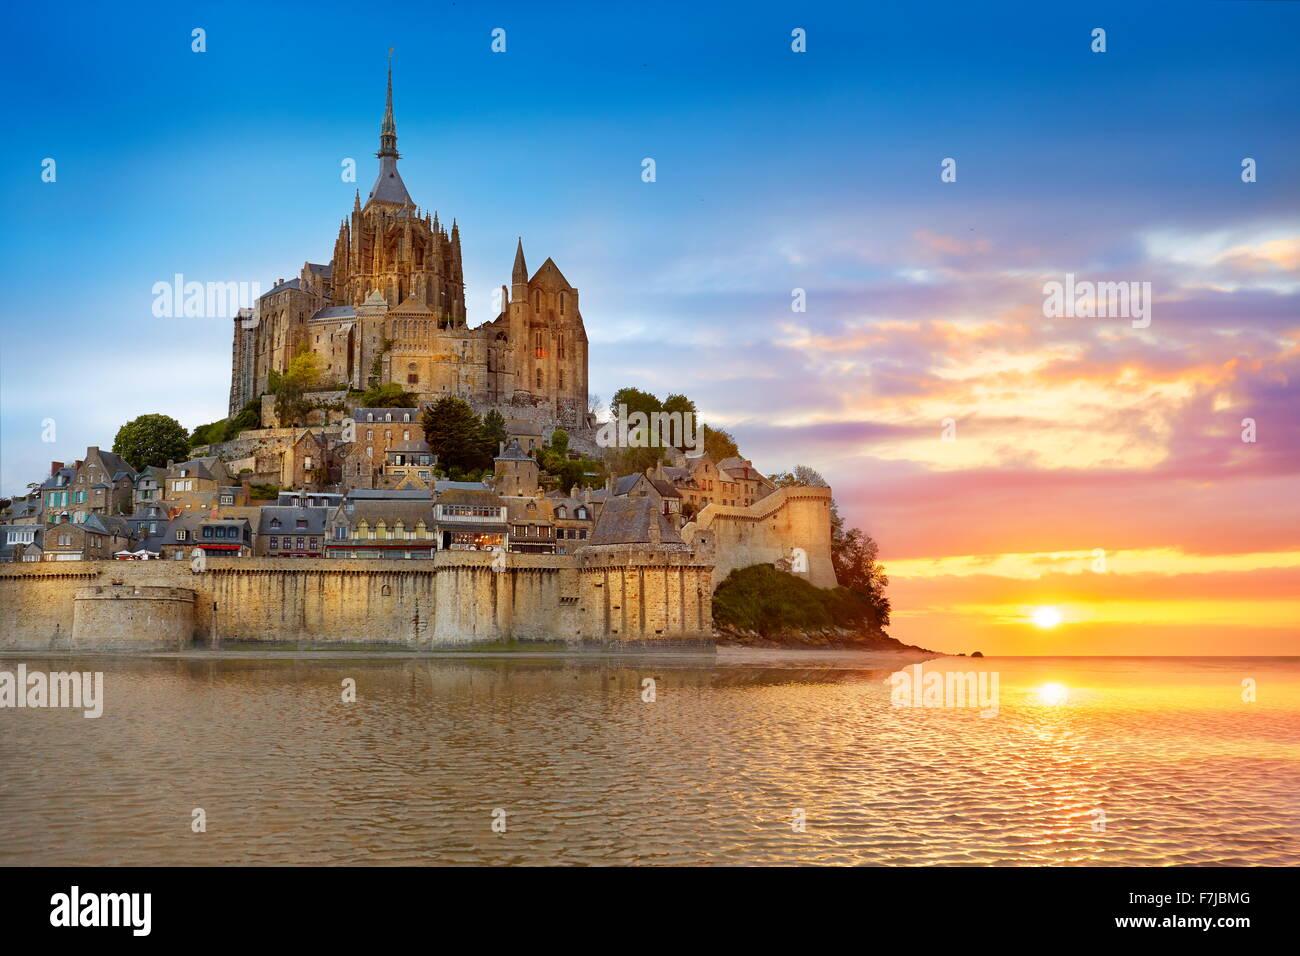 Mont Saint Michel at sunset, Normandy, France Stock Photo